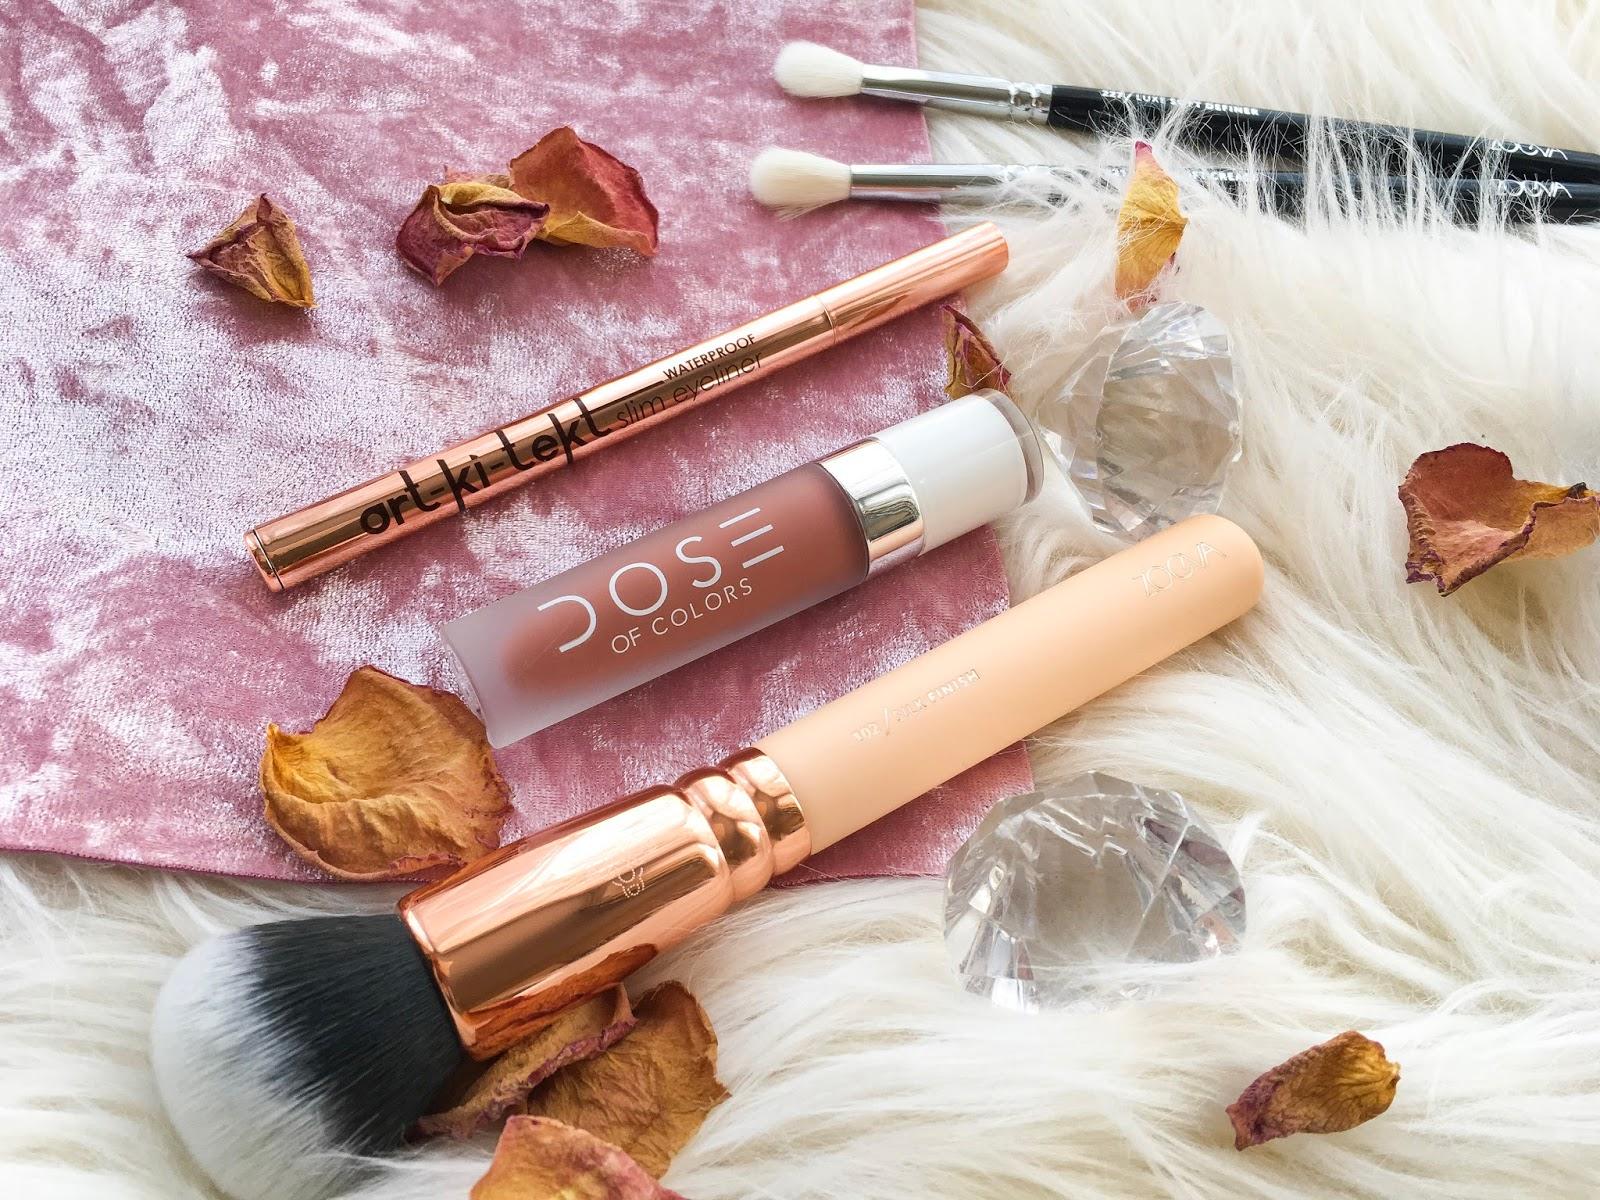 zoeva rose golden vol2 silk finish brush, la splash artkitekt eyeliner, dose of colors truffle, zoeva crease brush